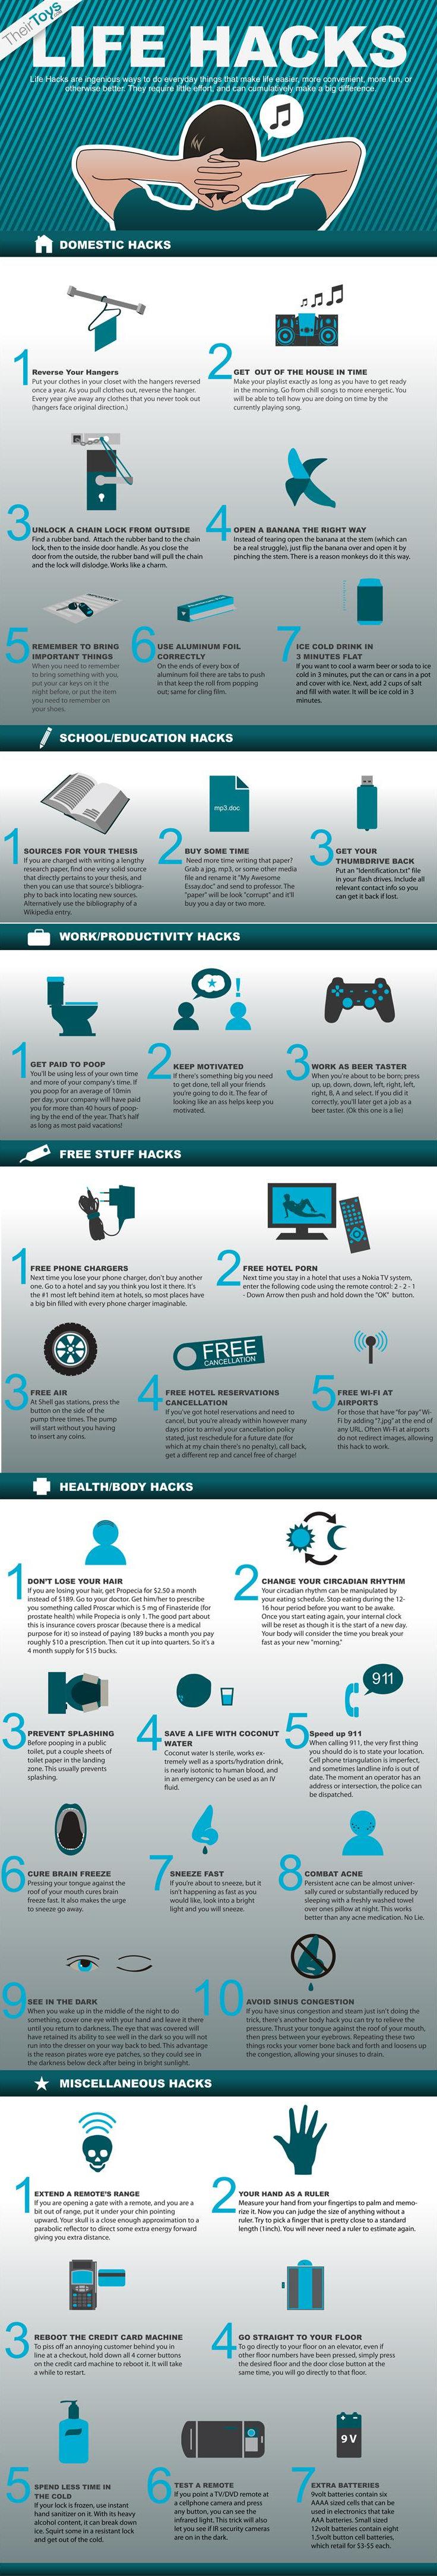 Top 10 Life Hacks